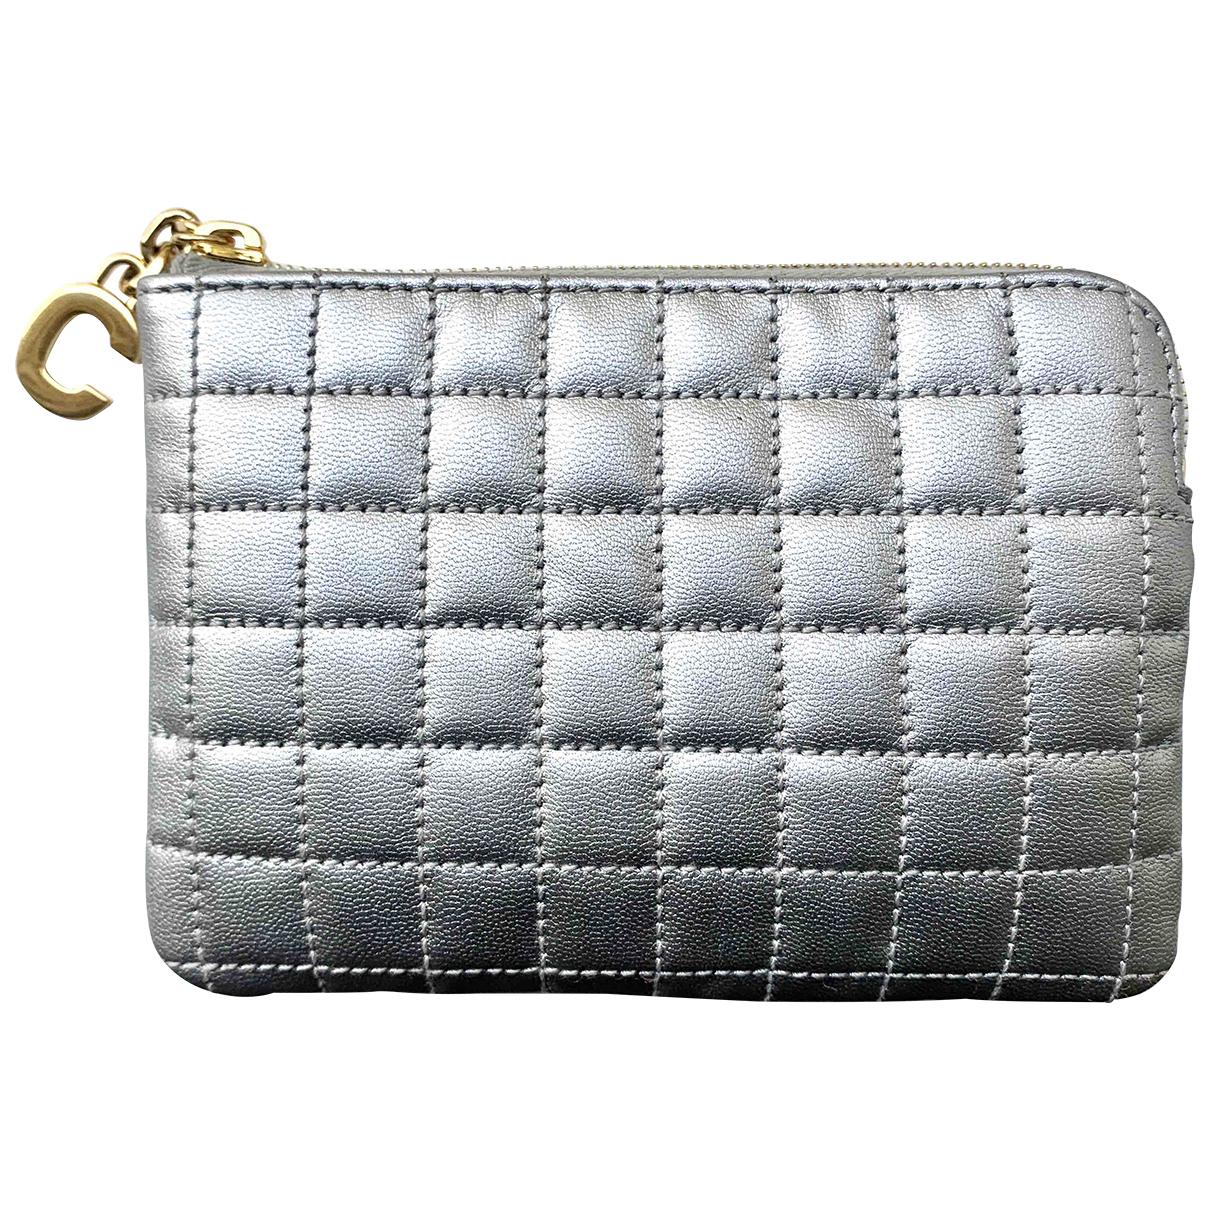 Celine \N Silver Leather Purses, wallet & cases for Women \N